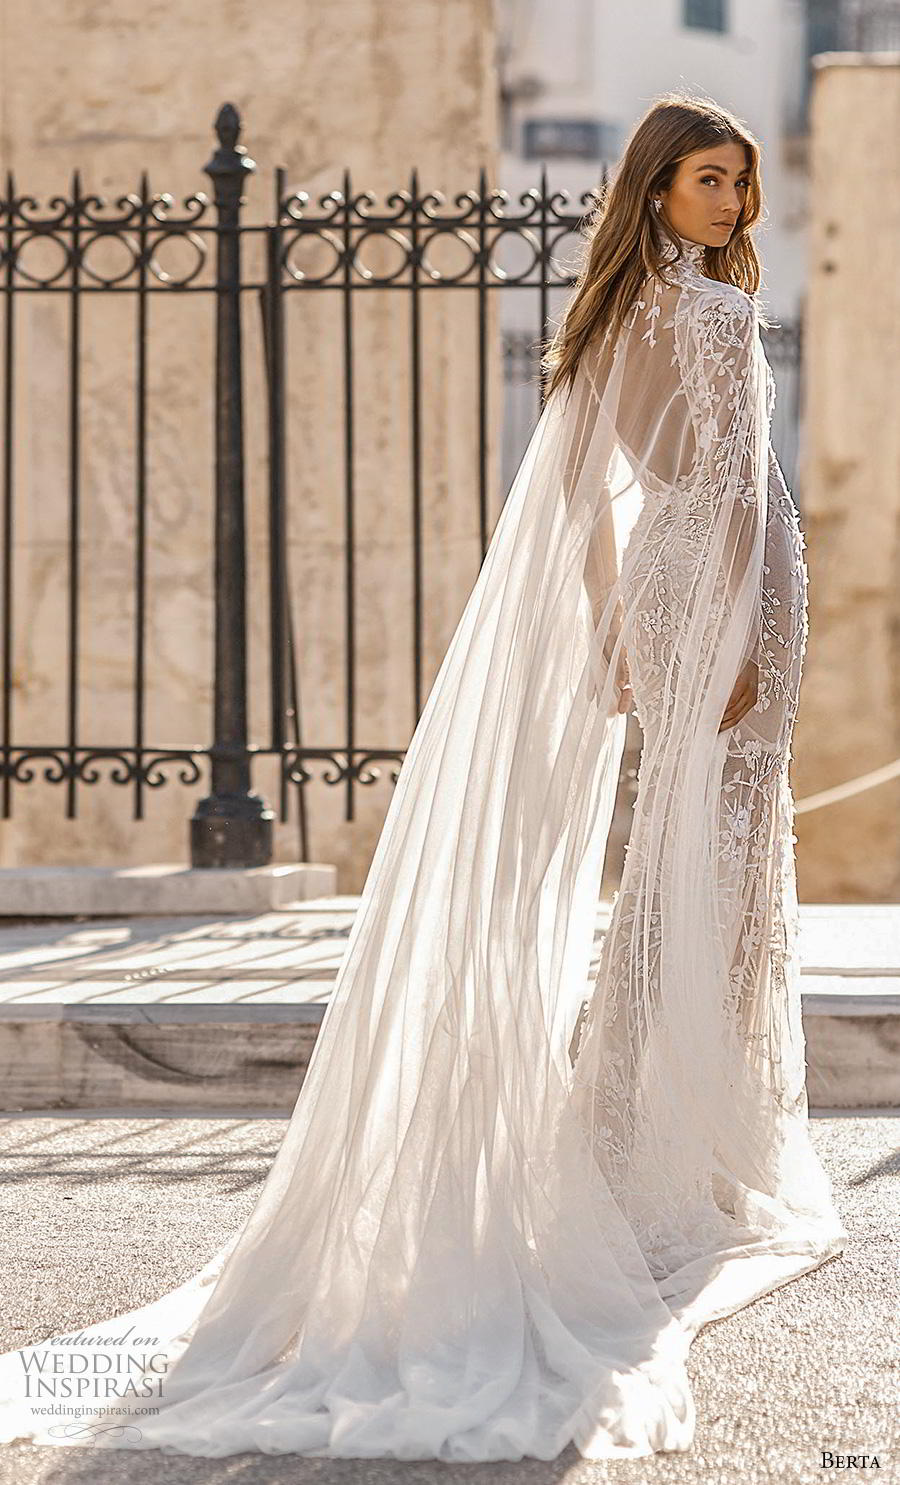 berta fall 2019 bridal long sleeves v neck full embellishment elegant glamorous fit and flare sheath wedding dress with cape backless scoop back medium train (6) bv